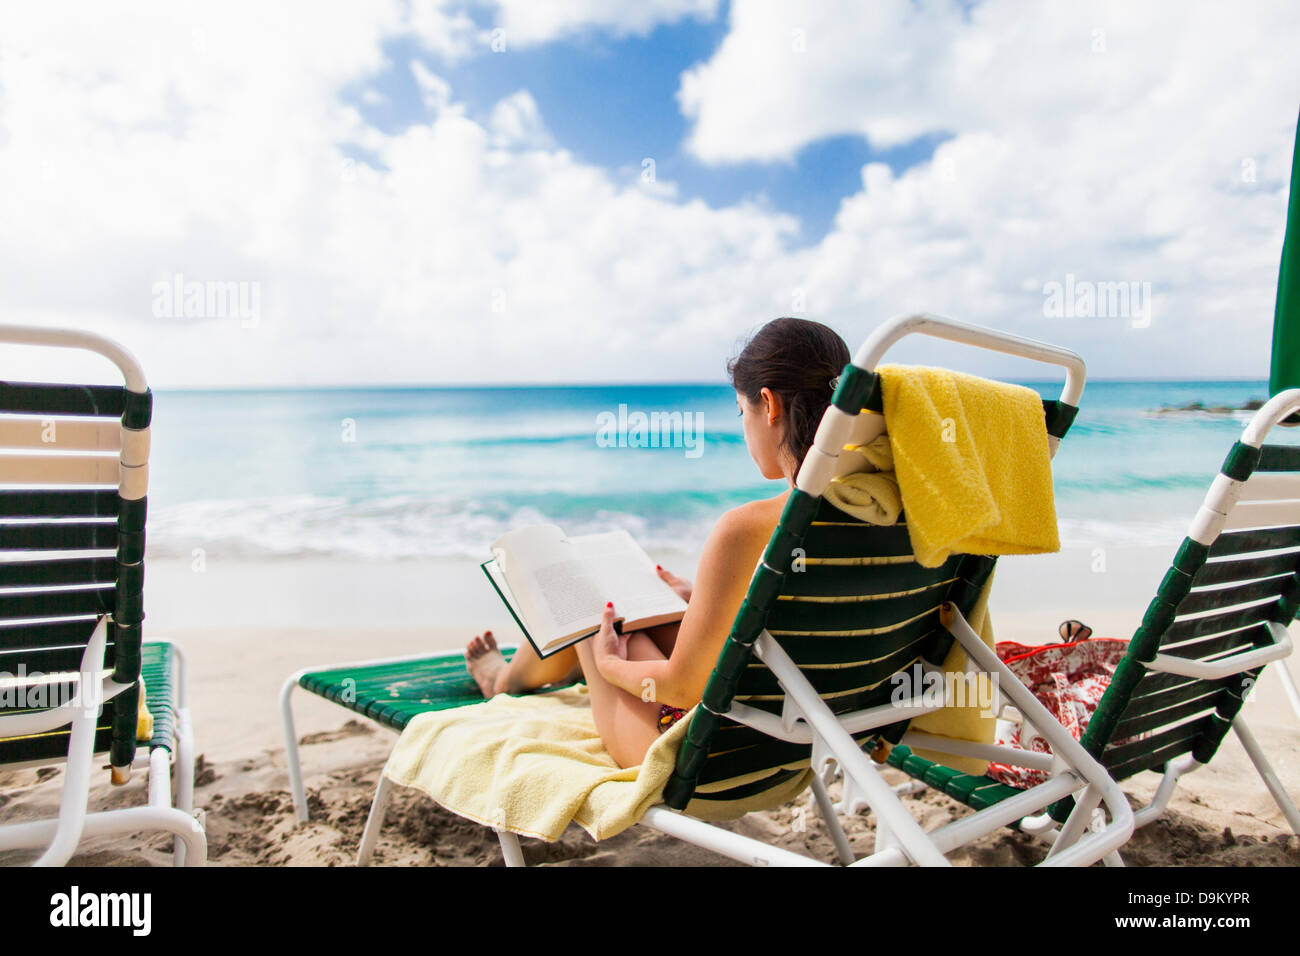 Woman reading book on beach, St Maarten, Netherlands - Stock Image